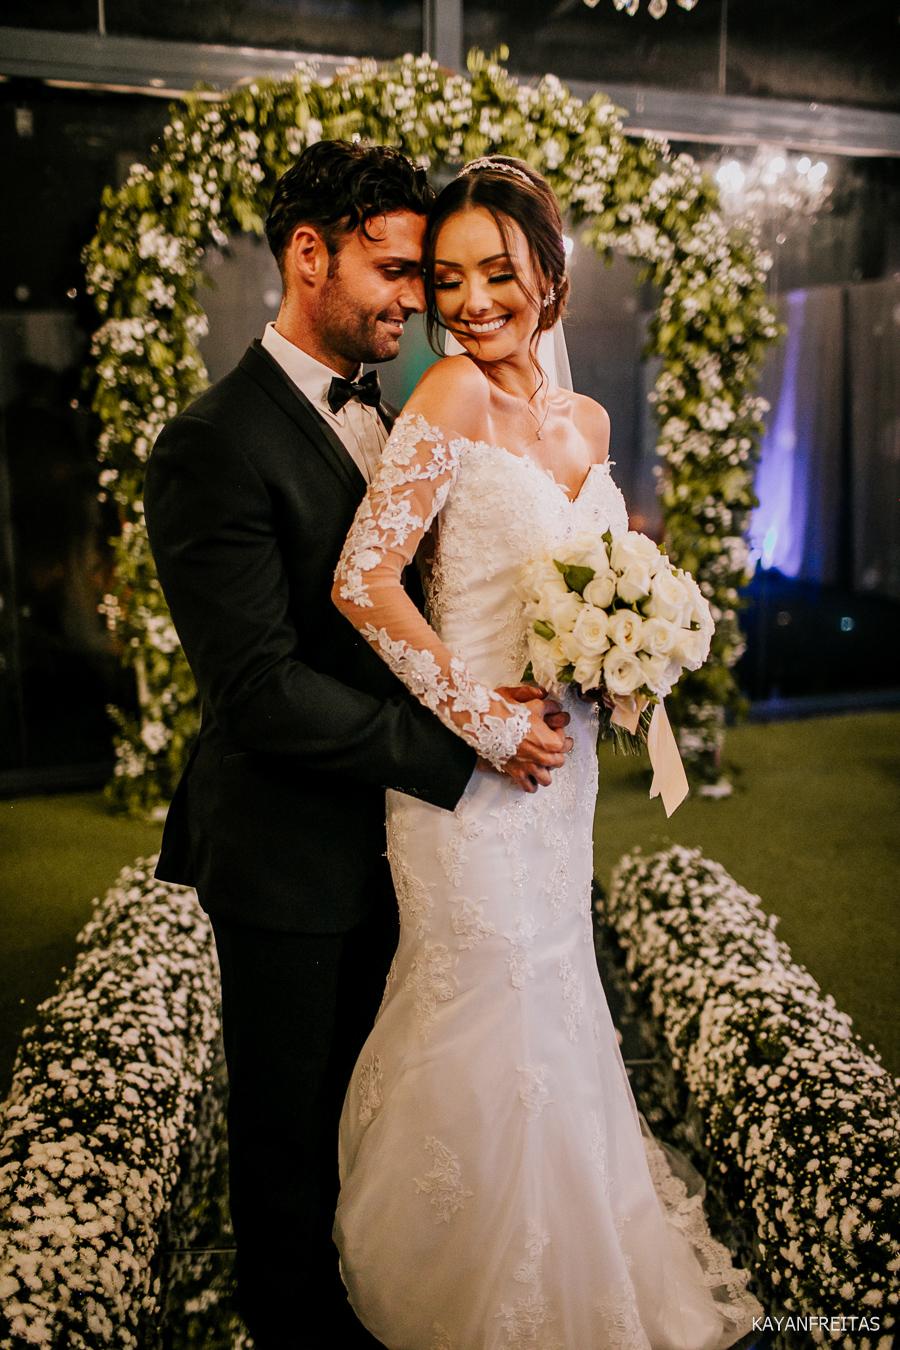 casamento-indaia-floripa-0071 Casamento Indaiá Florianópolis - Deise e Dário